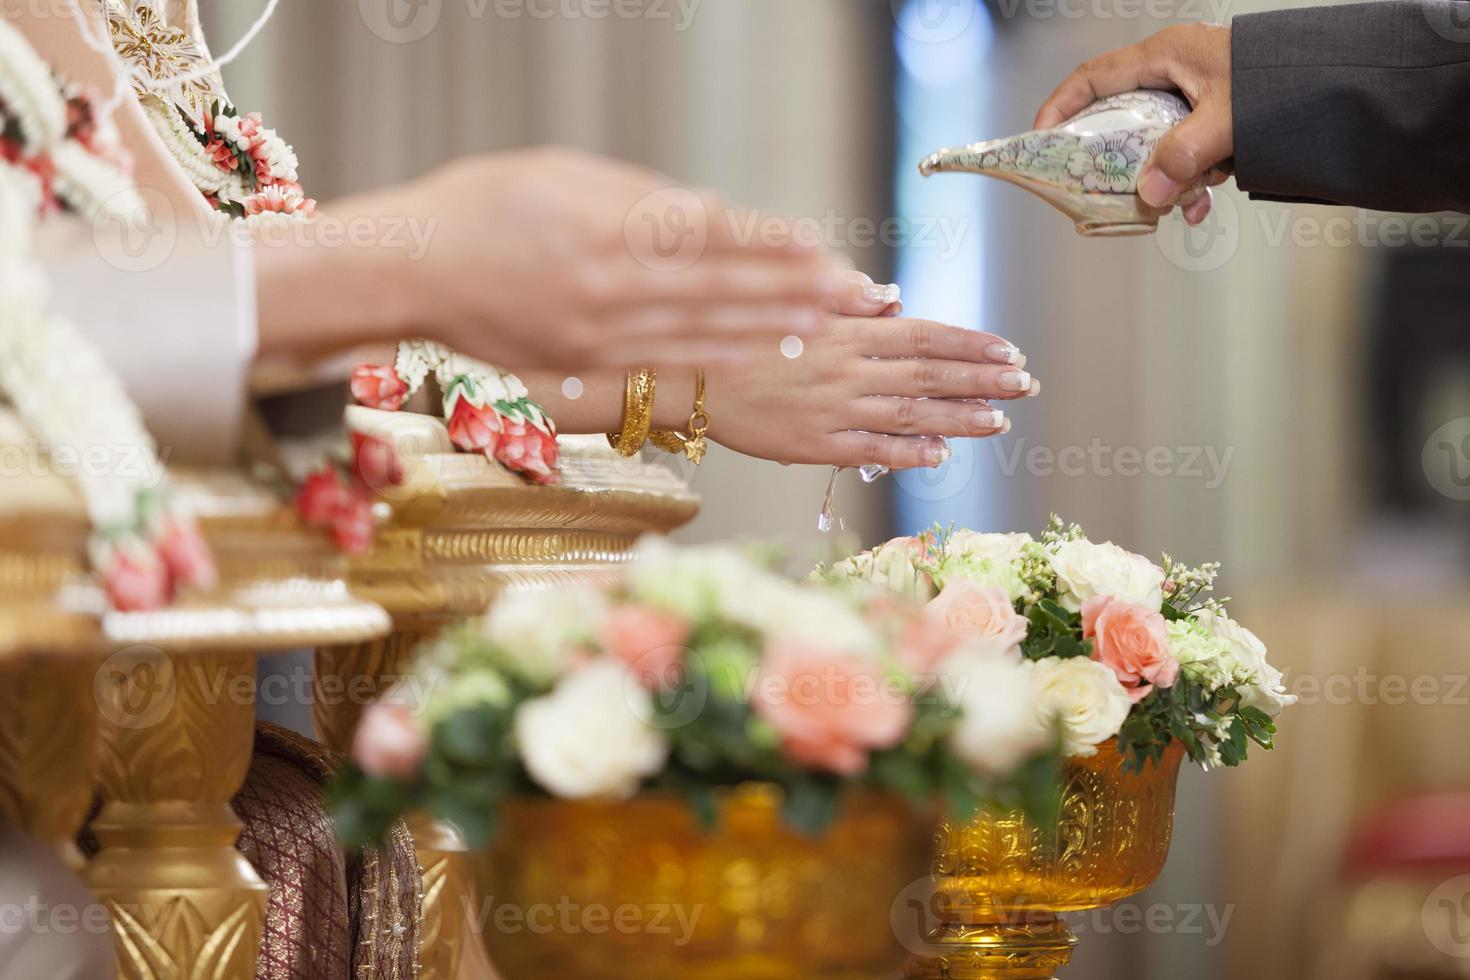 Thai wedding ceremony culture marriage. - (Selective focus) photo